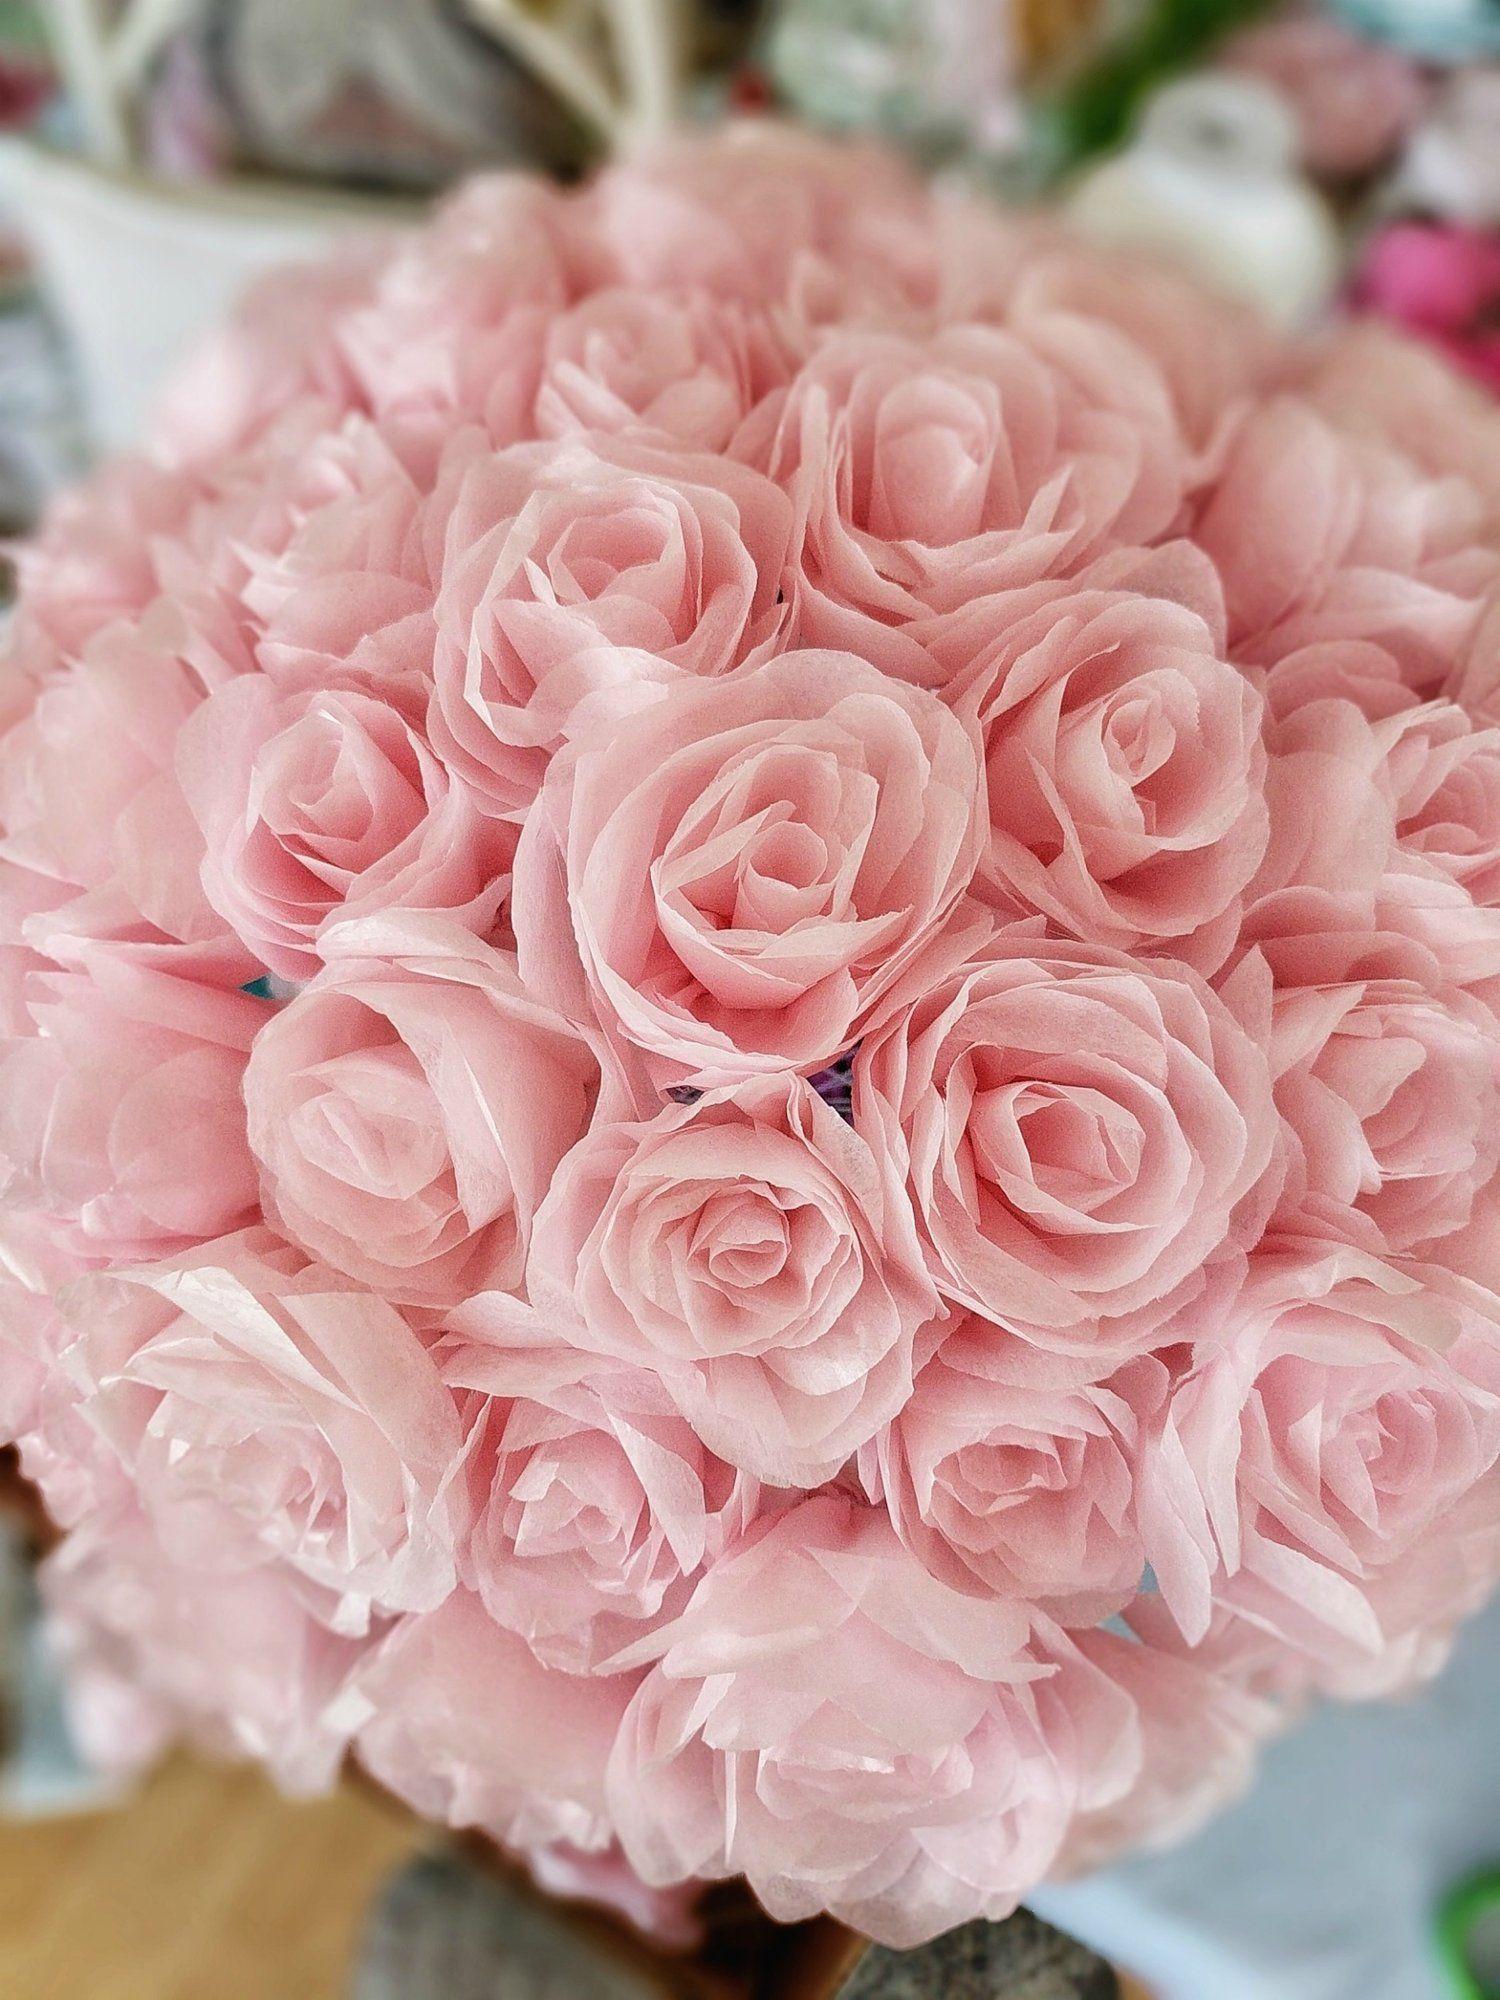 Rolled Tissue Paper Flowers In 3 Steps Allmywaysandrea Tissue